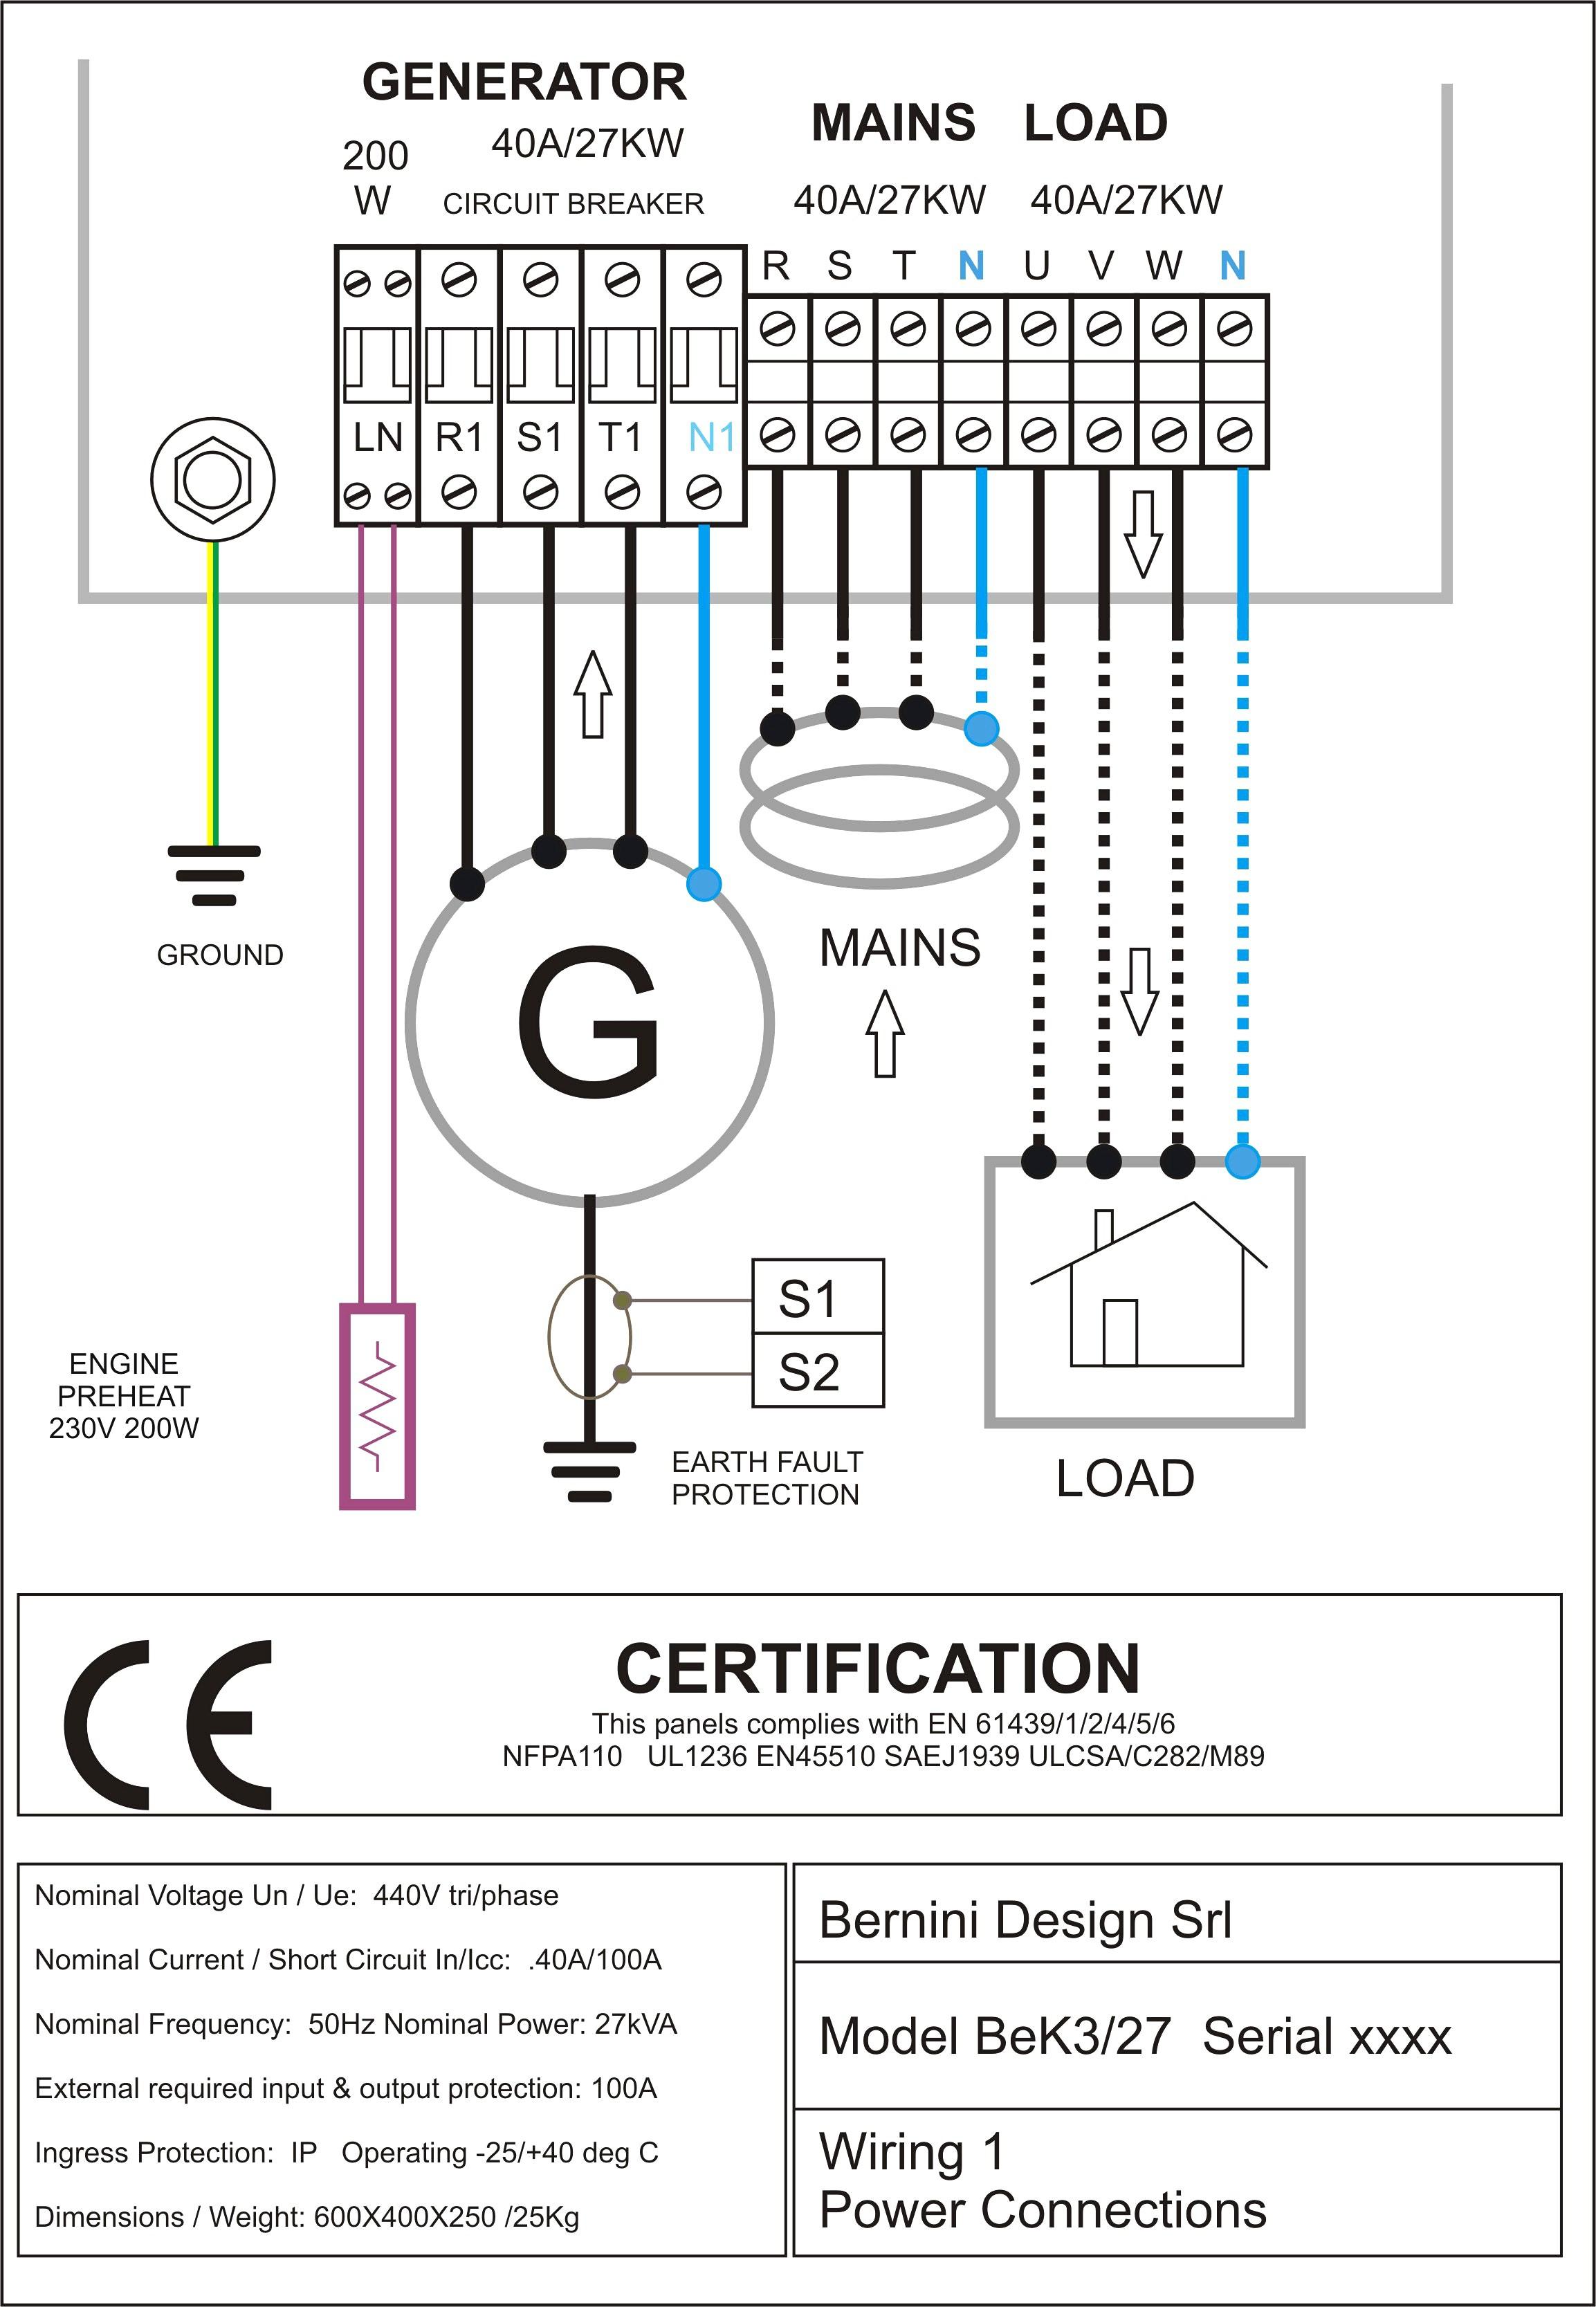 Generator Transfer Switch Wiring Diagram Lovely 3 Phase Automatic In - Generator Automatic Transfer Switch Wiring Diagram